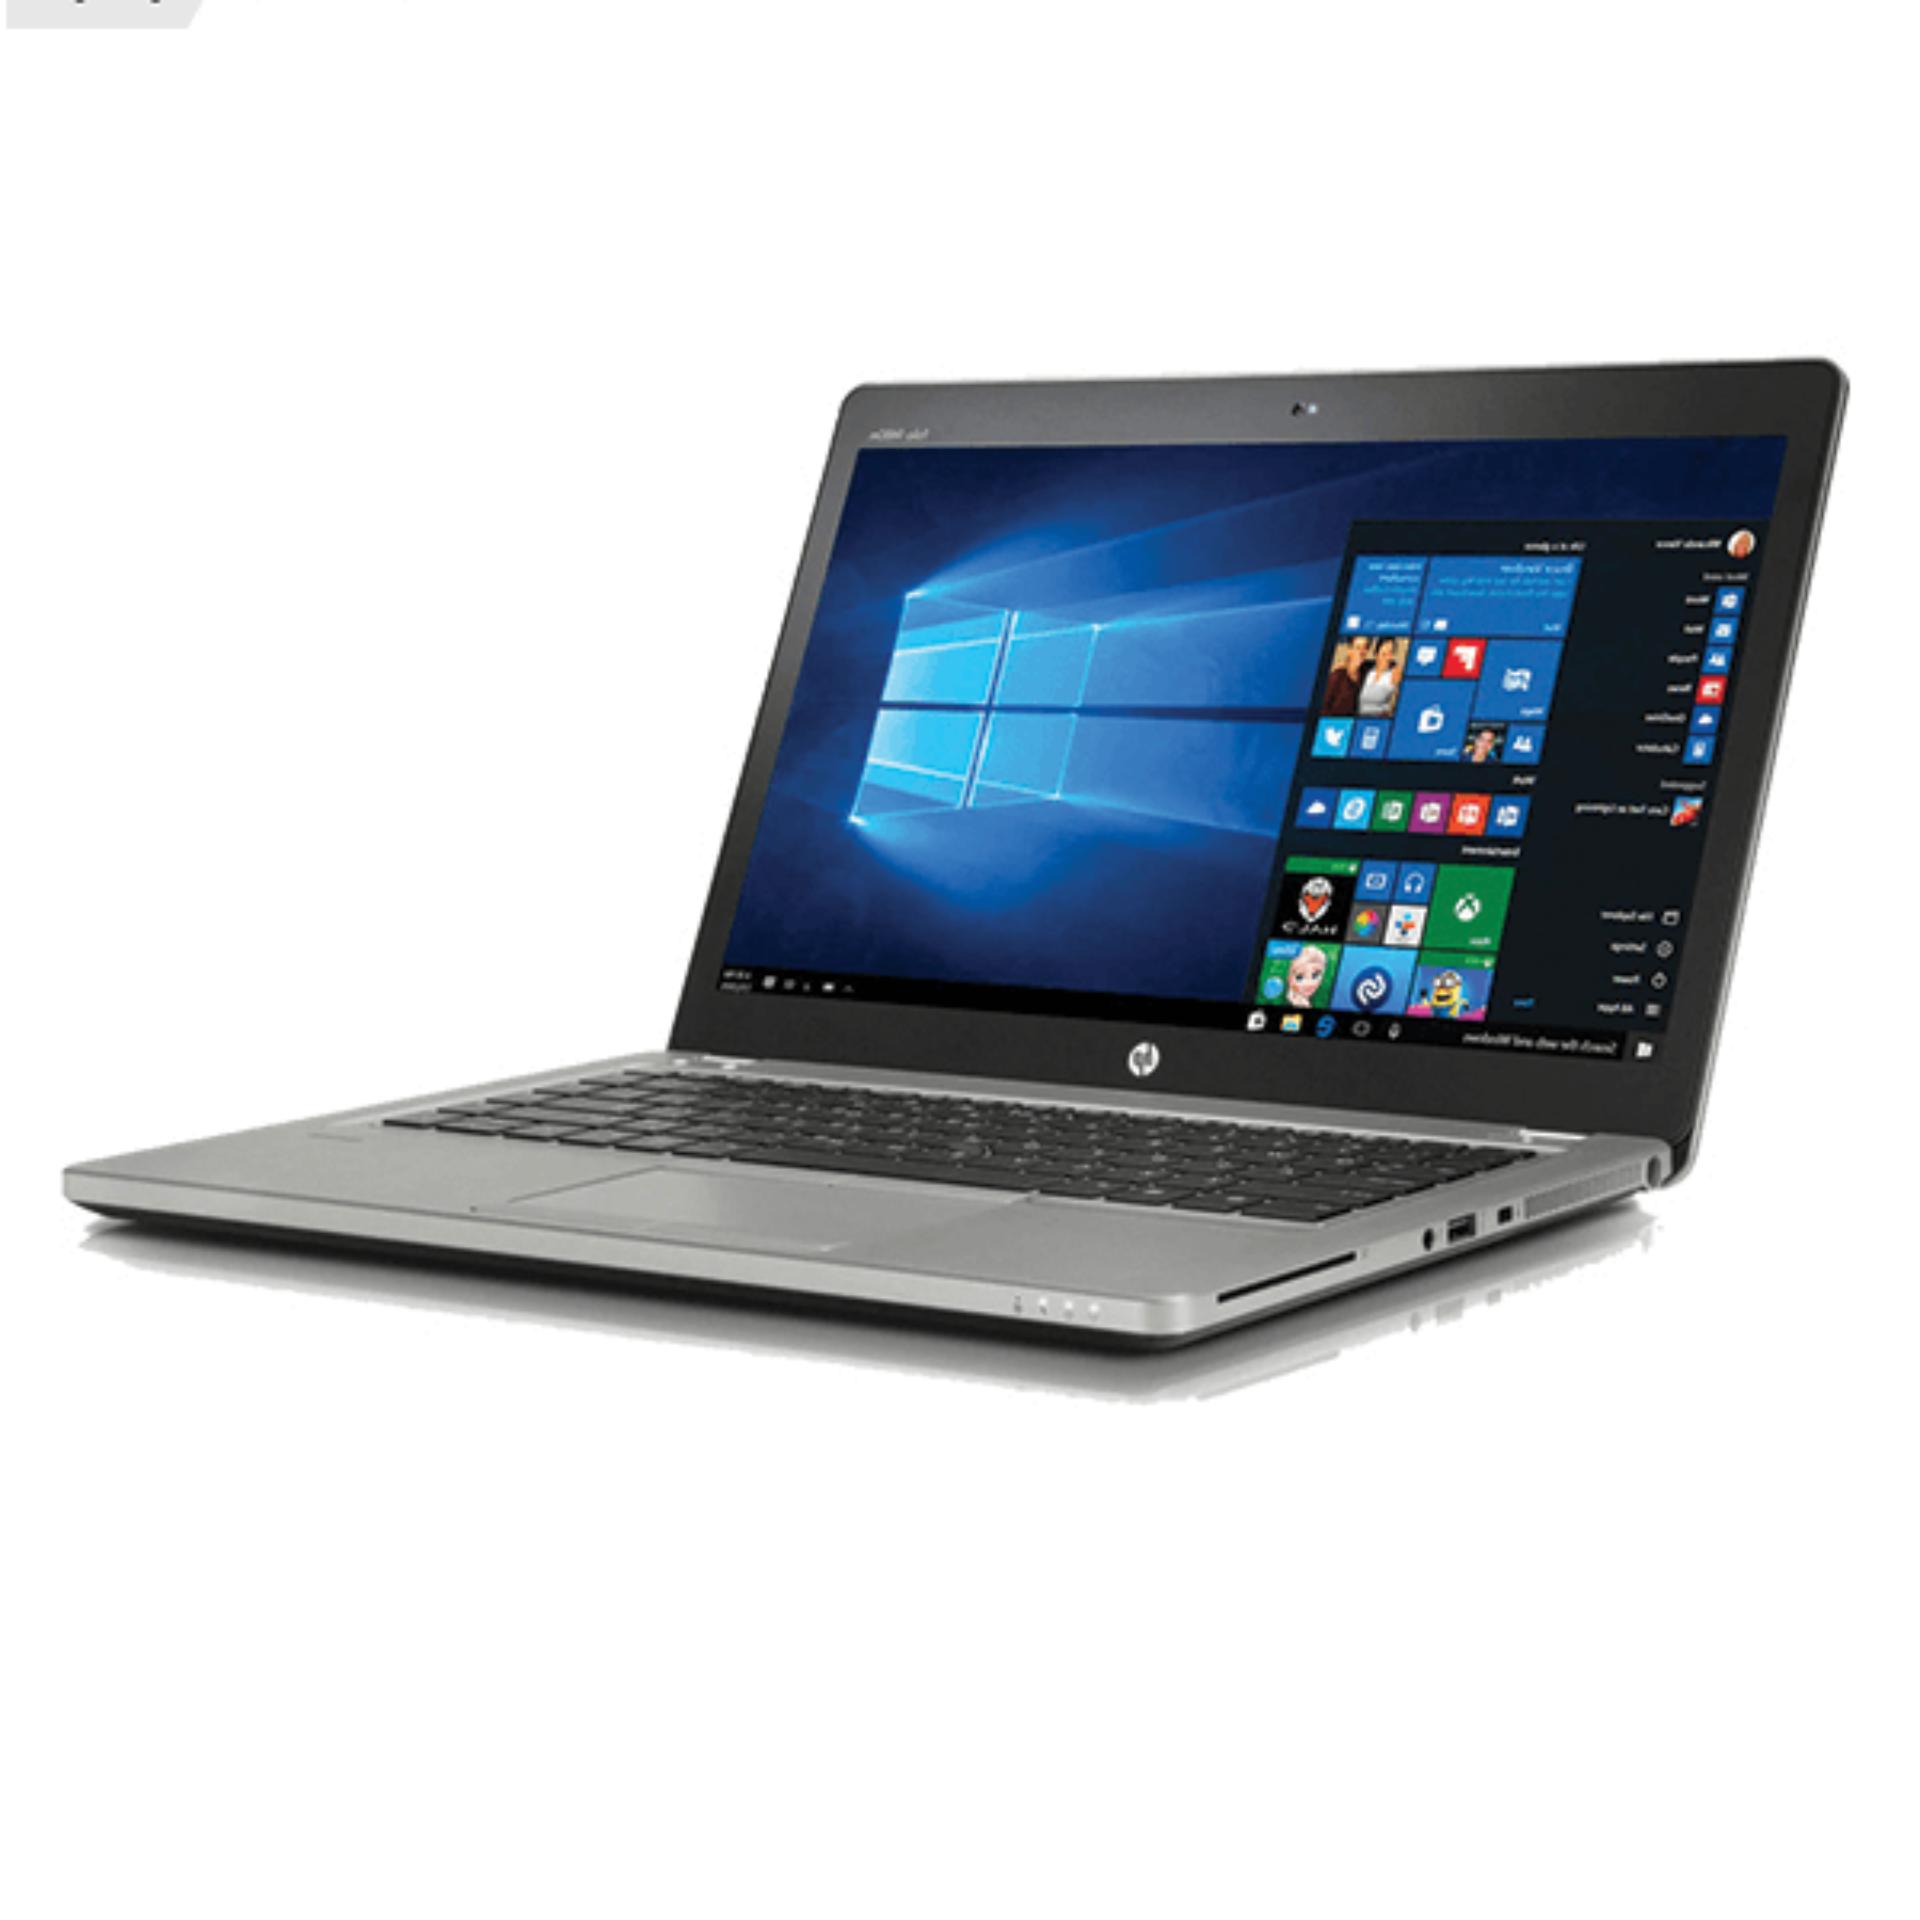 Laptop HP Elipbook 9480M Core i5-4300U, 8gb Ram, 128gb SSD, 14inch HD, vỏ nhôm toàn thân